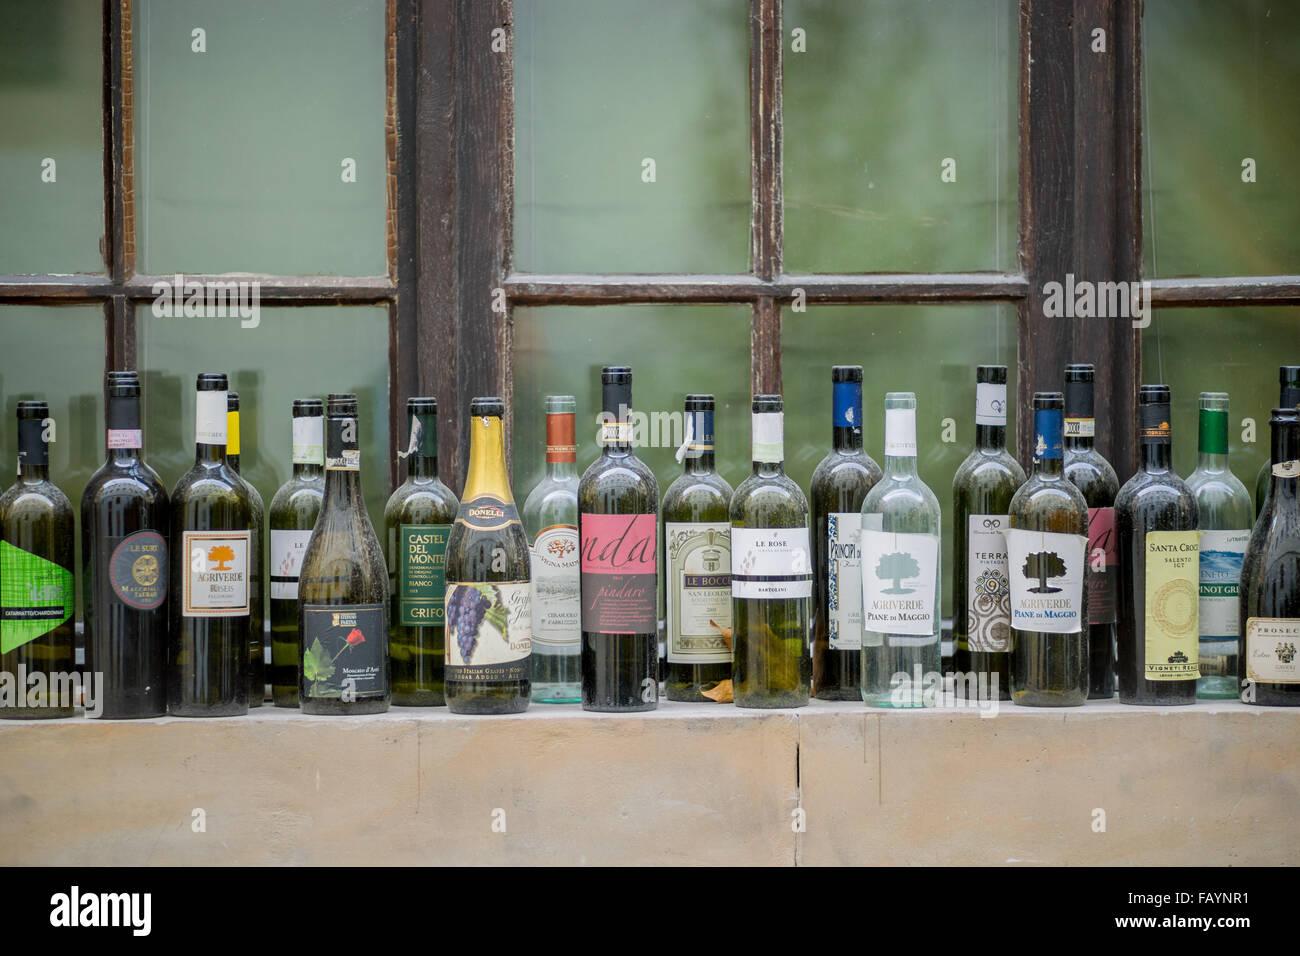 Empty wine bottles standing on the windowsill - Stock Image